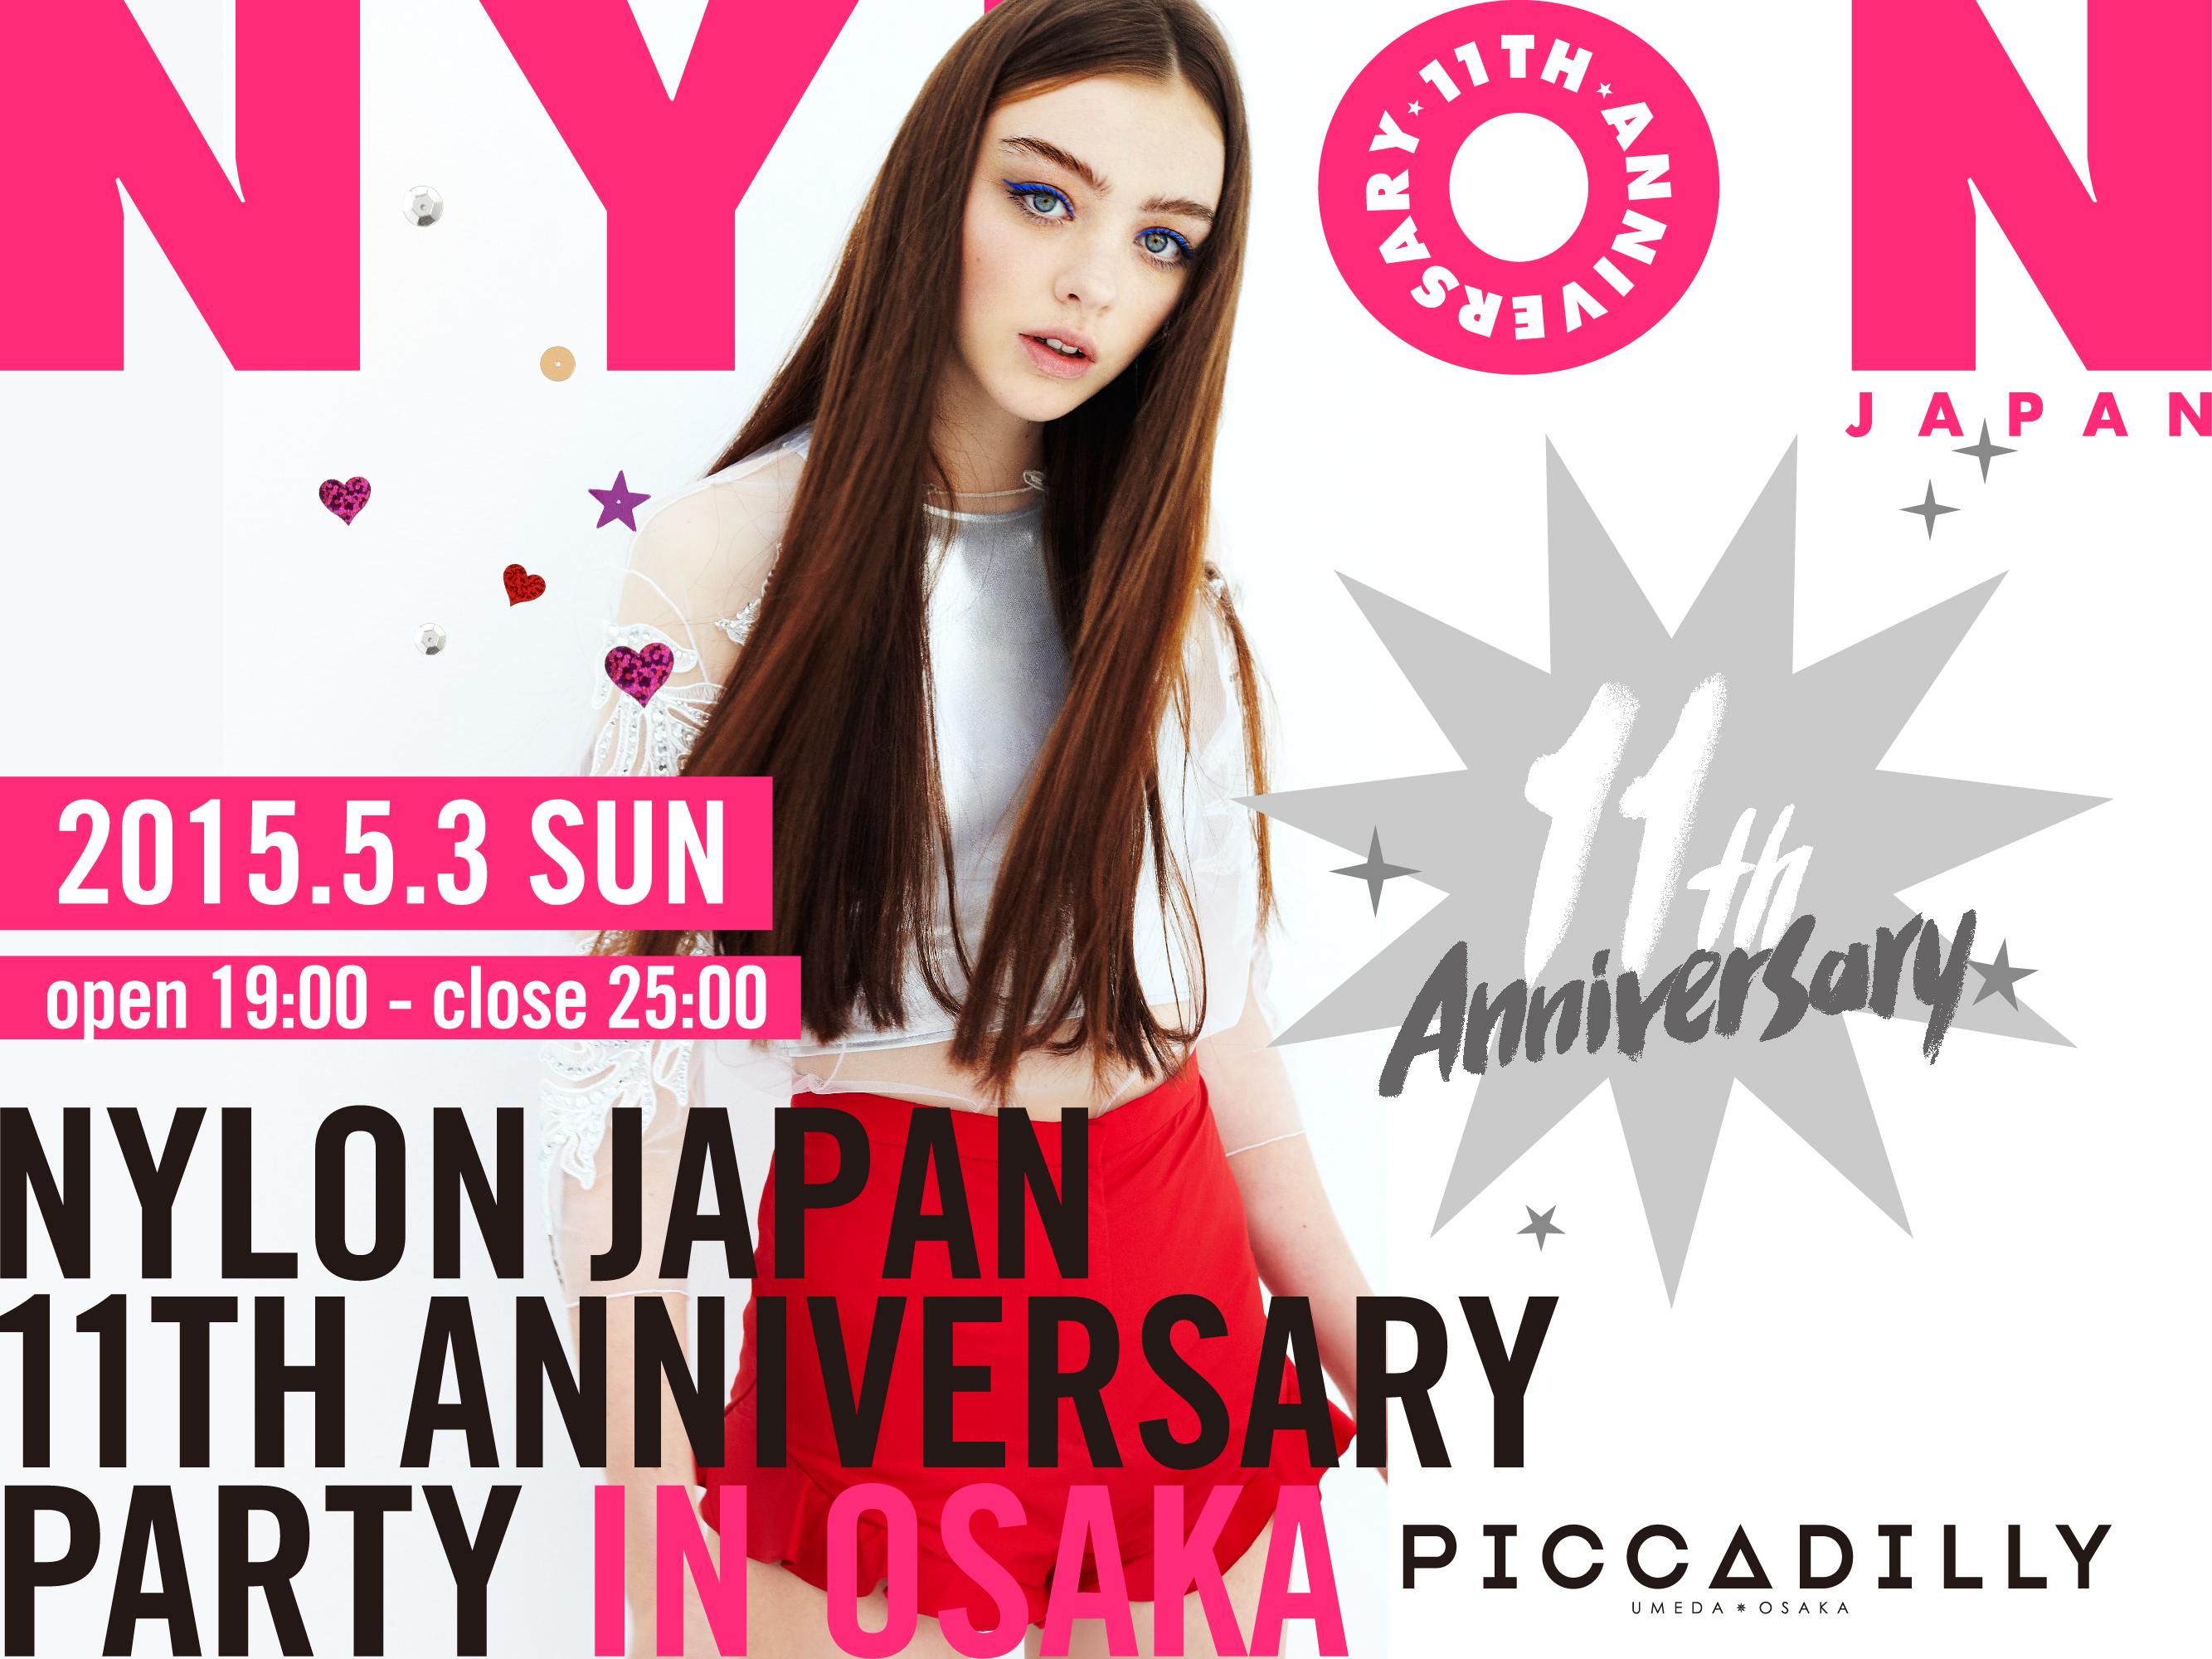 NYLON 11th anniversary